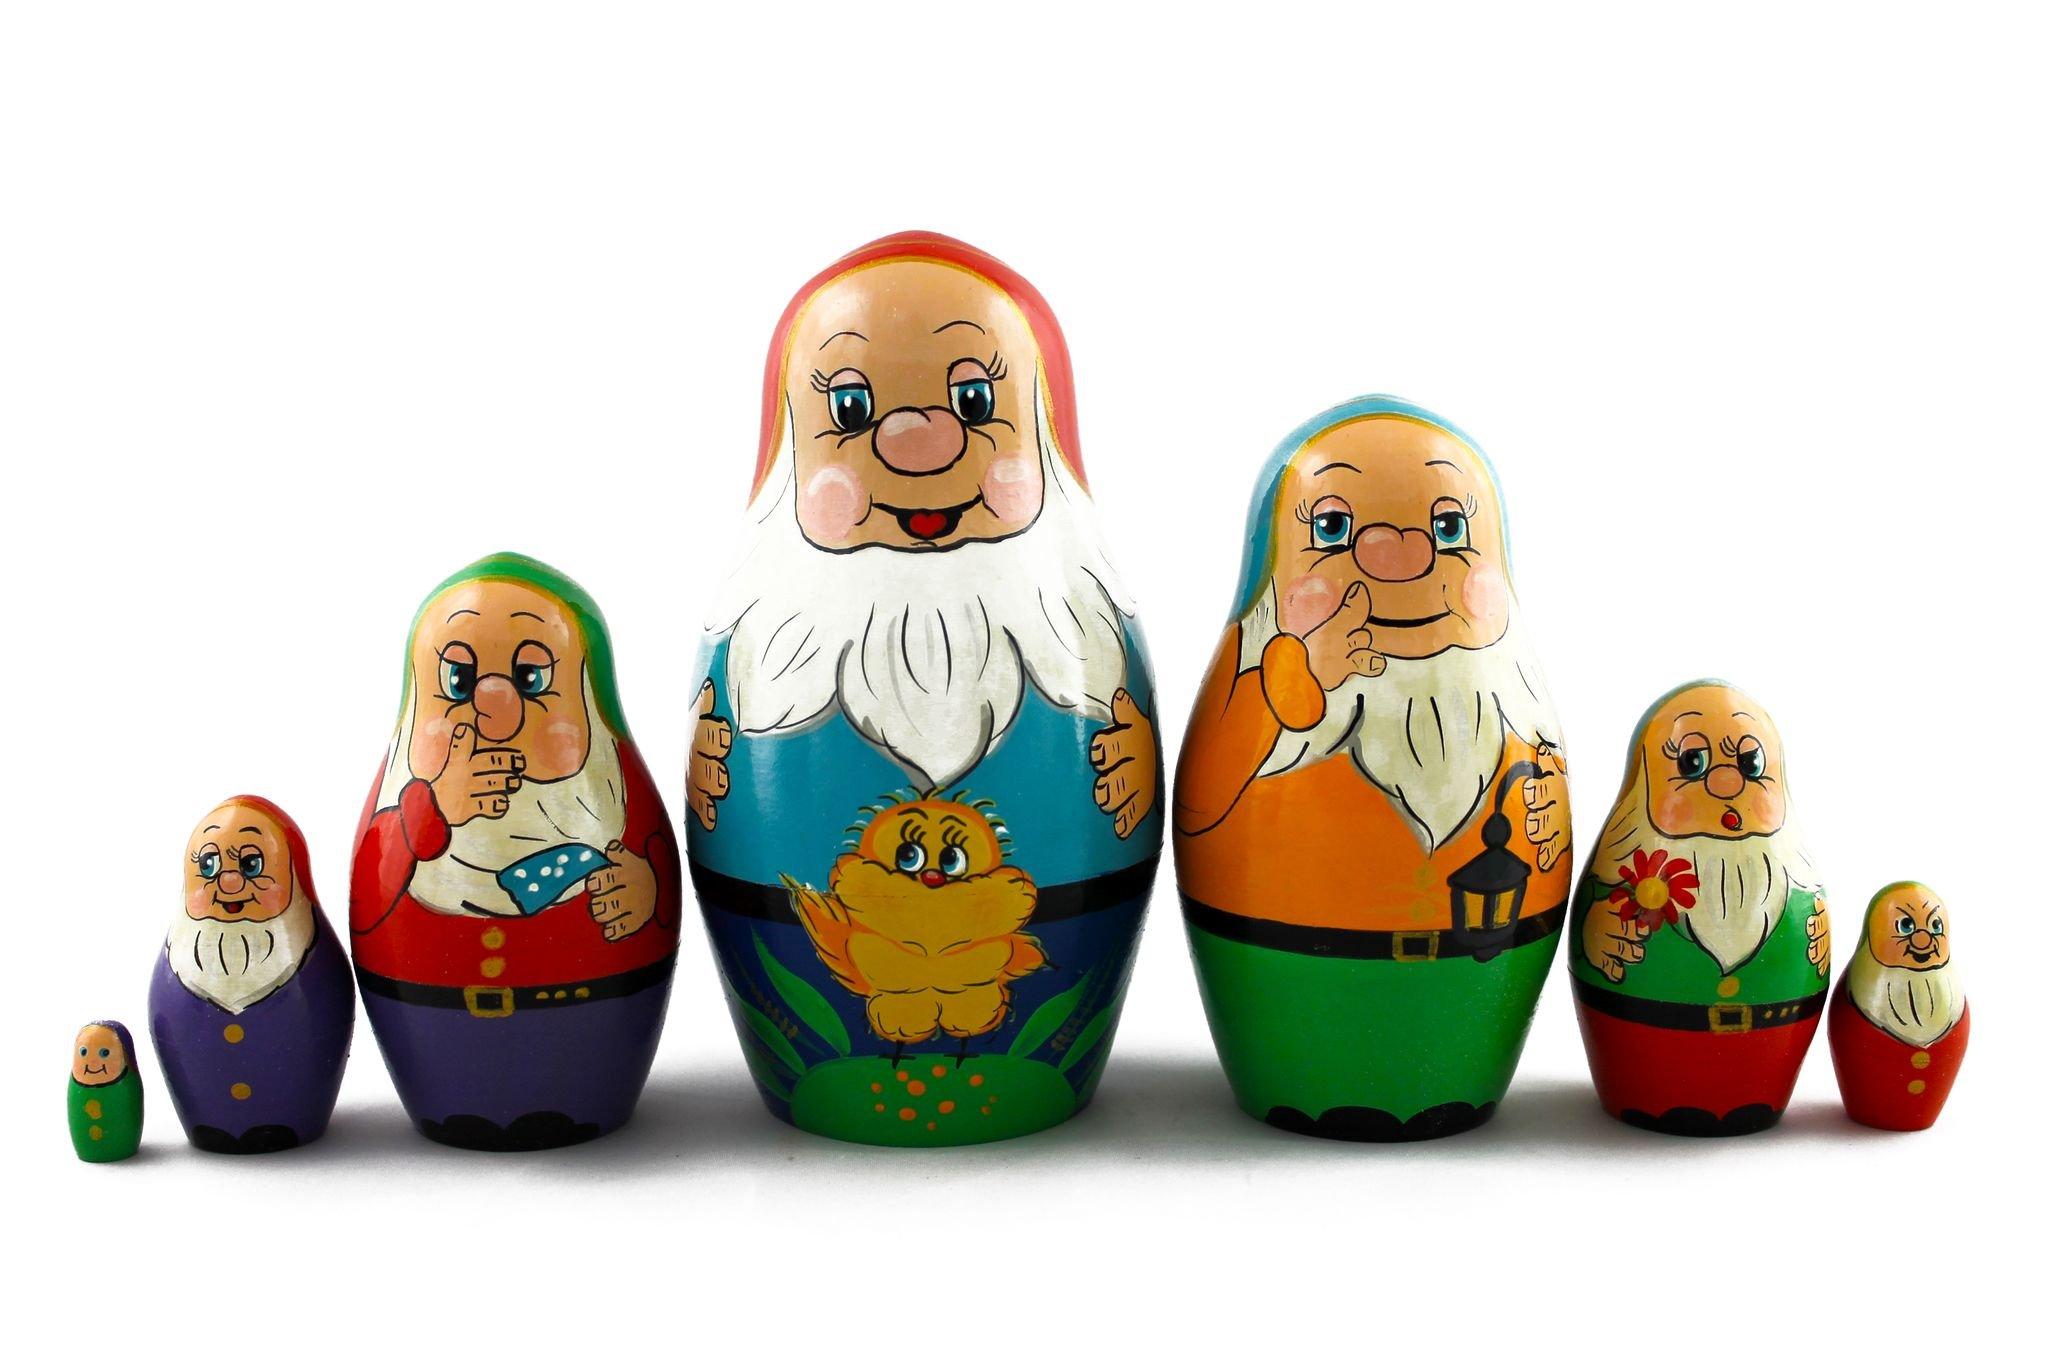 Matryoshka Russian Nesting Doll Babushka Beautiful Dwarf Seven Dwarfs Set 7 Pieces Pcs Hand Painted Handmade Souvenir Gift Handicraft by MATRYOSHKA&HANDICRAFT (Image #6)